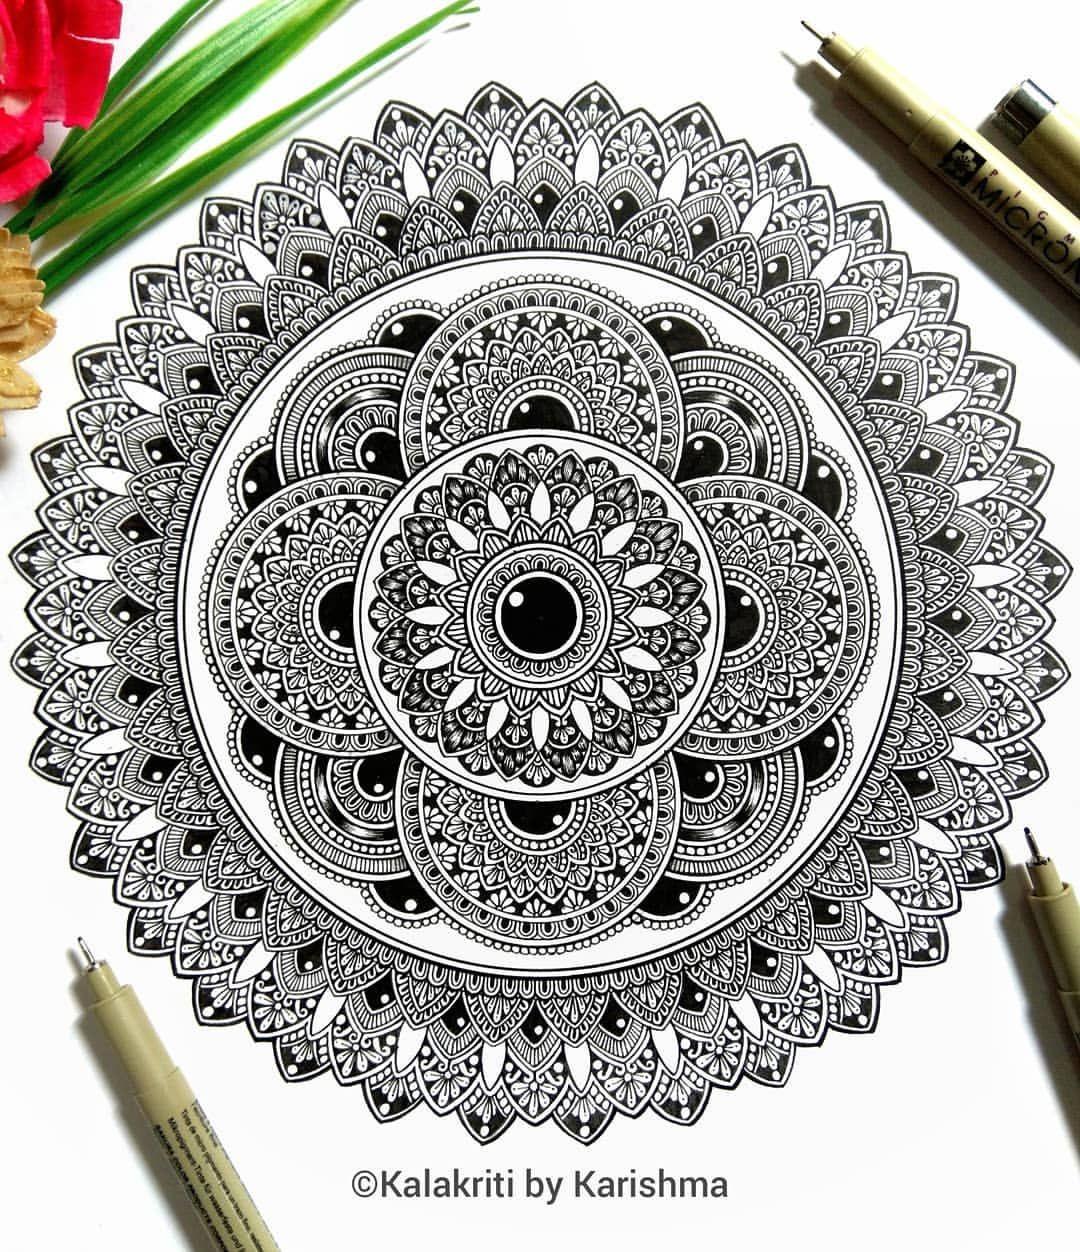 Pin On Stacked Mandalas By Karishma Srivastava